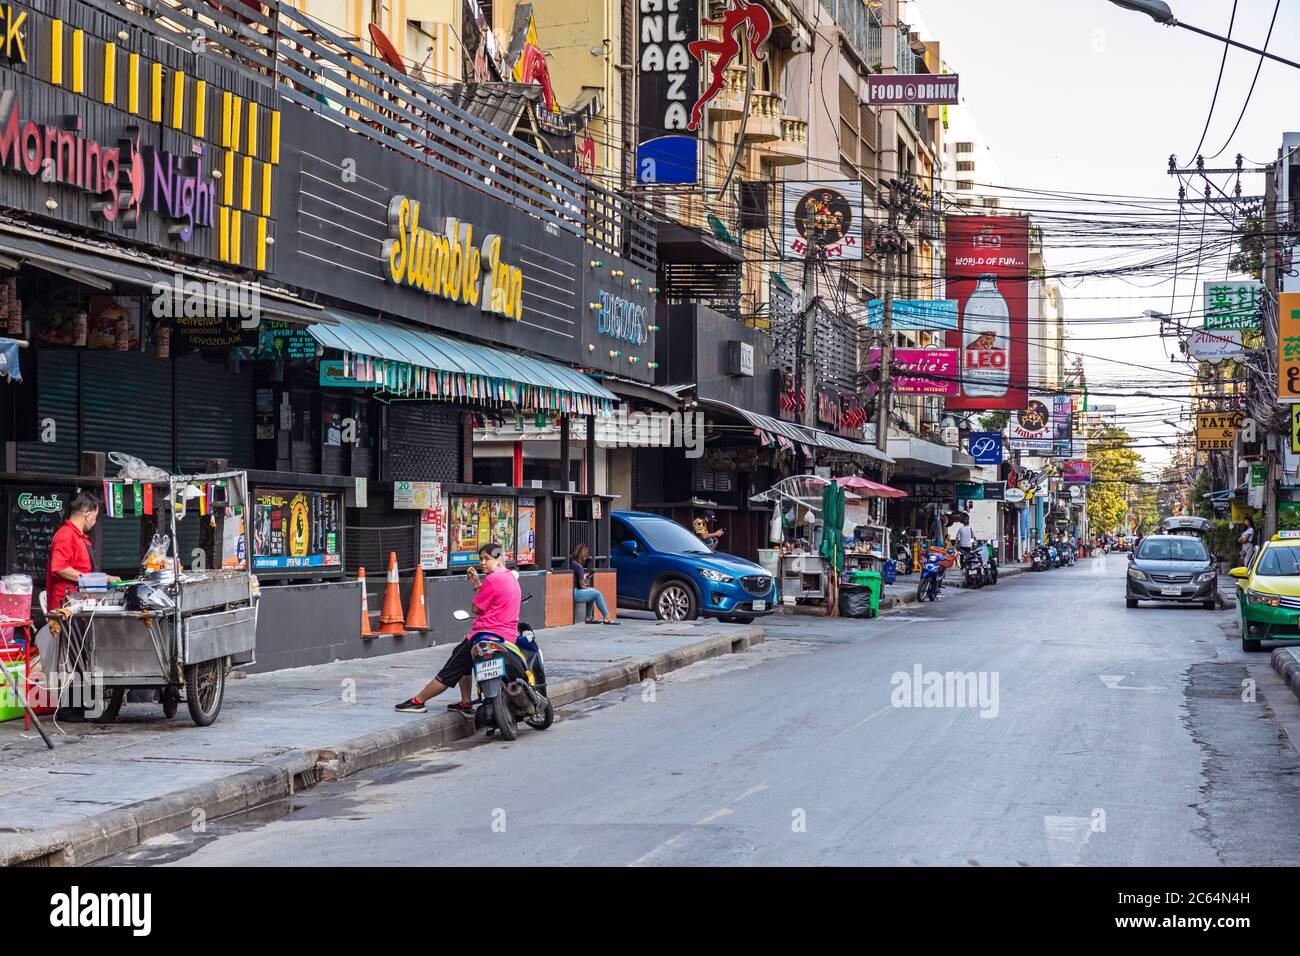 Distrito de luz roja de Soi Nana durante la pandemia de Covid 19, Bangkok, Tailandia Foto de stock